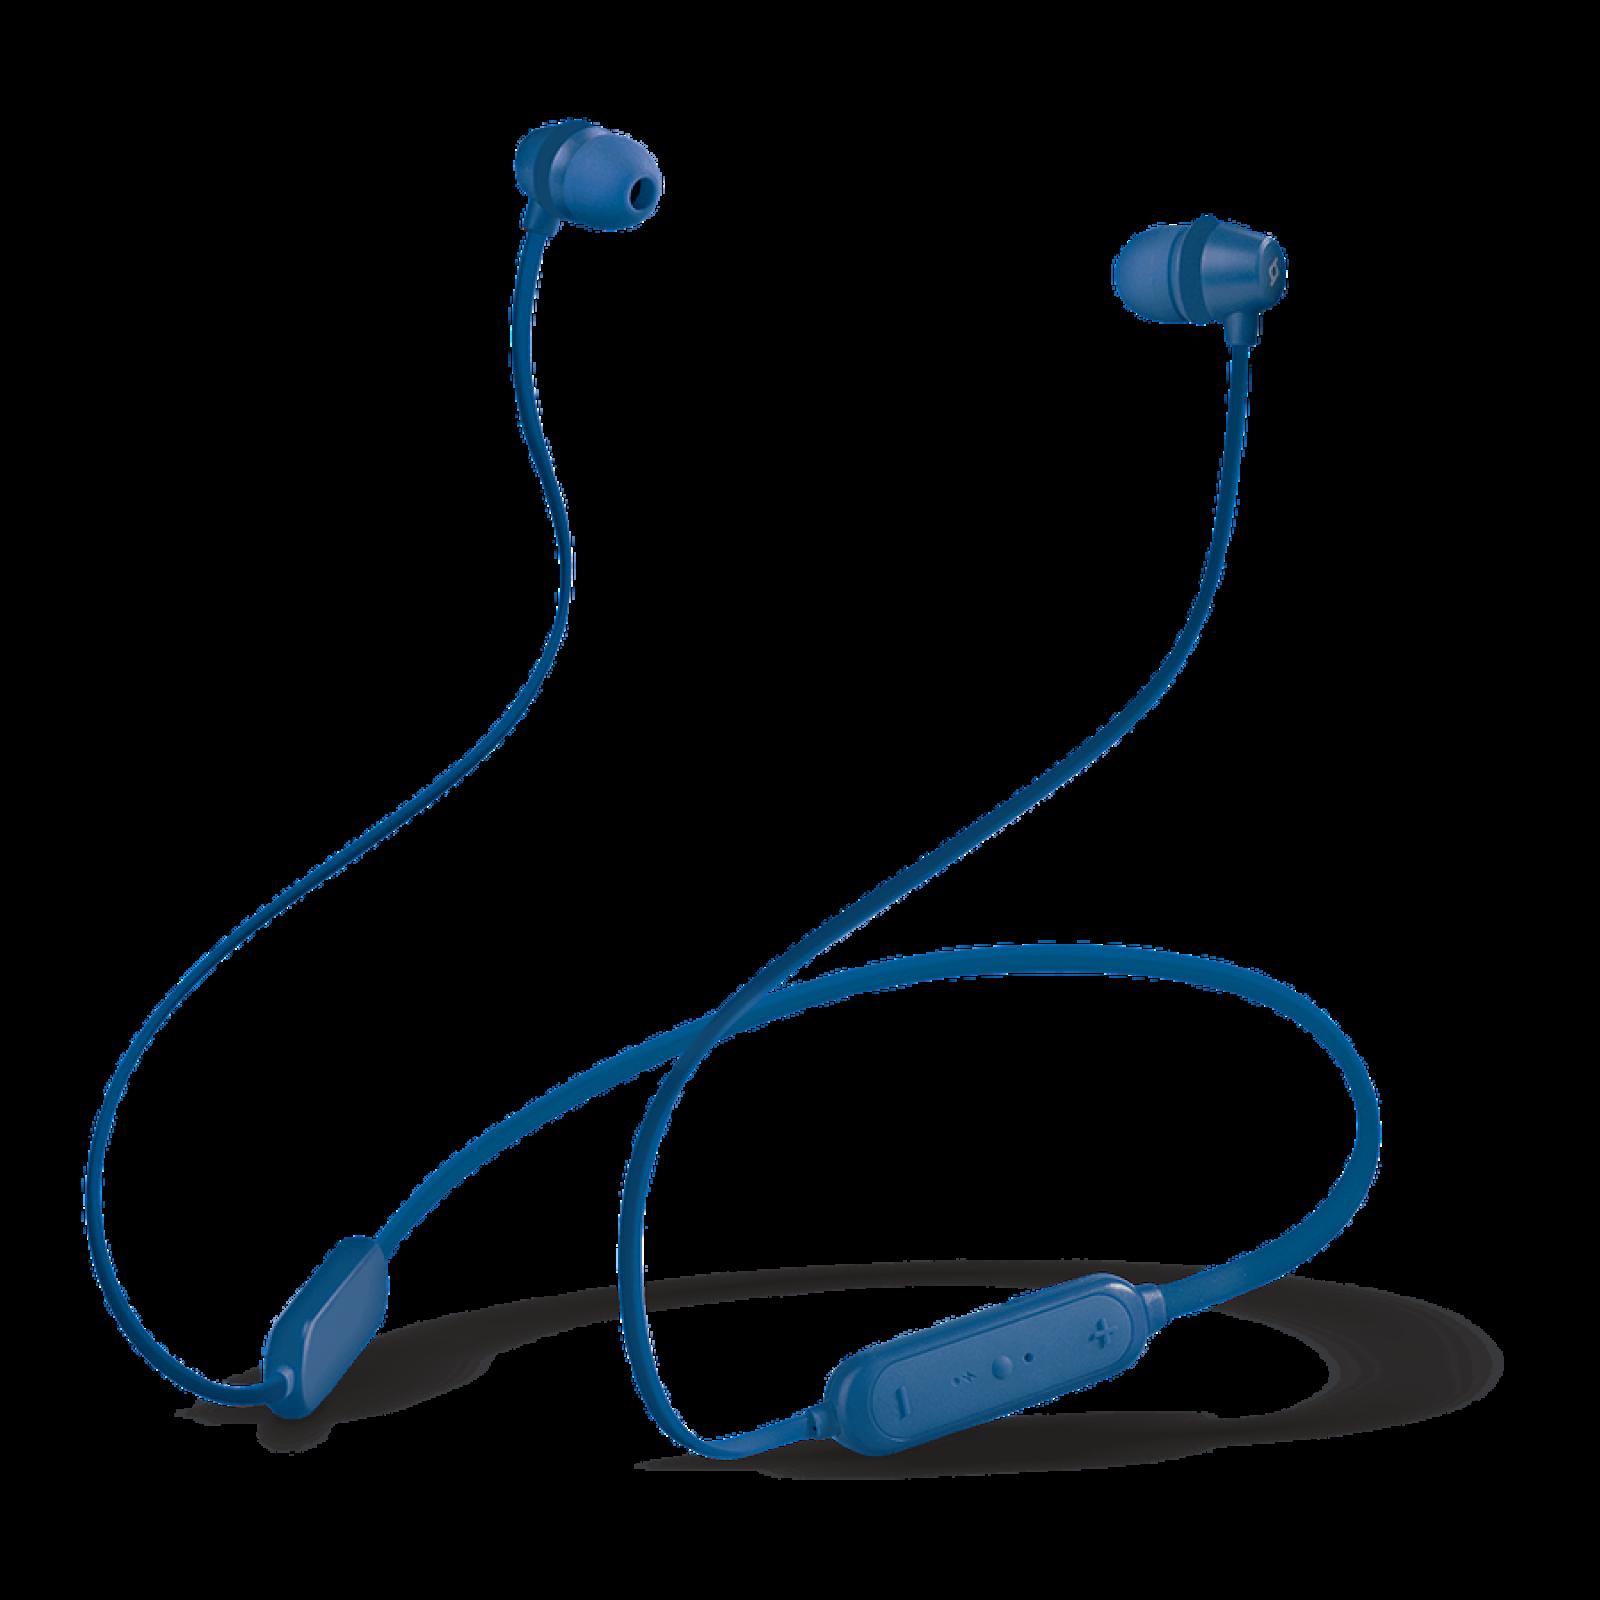 Bluetooth слушалки Soundbeat Pro Wireless BT Stereo Headset magnets - Тюркоаз,116262